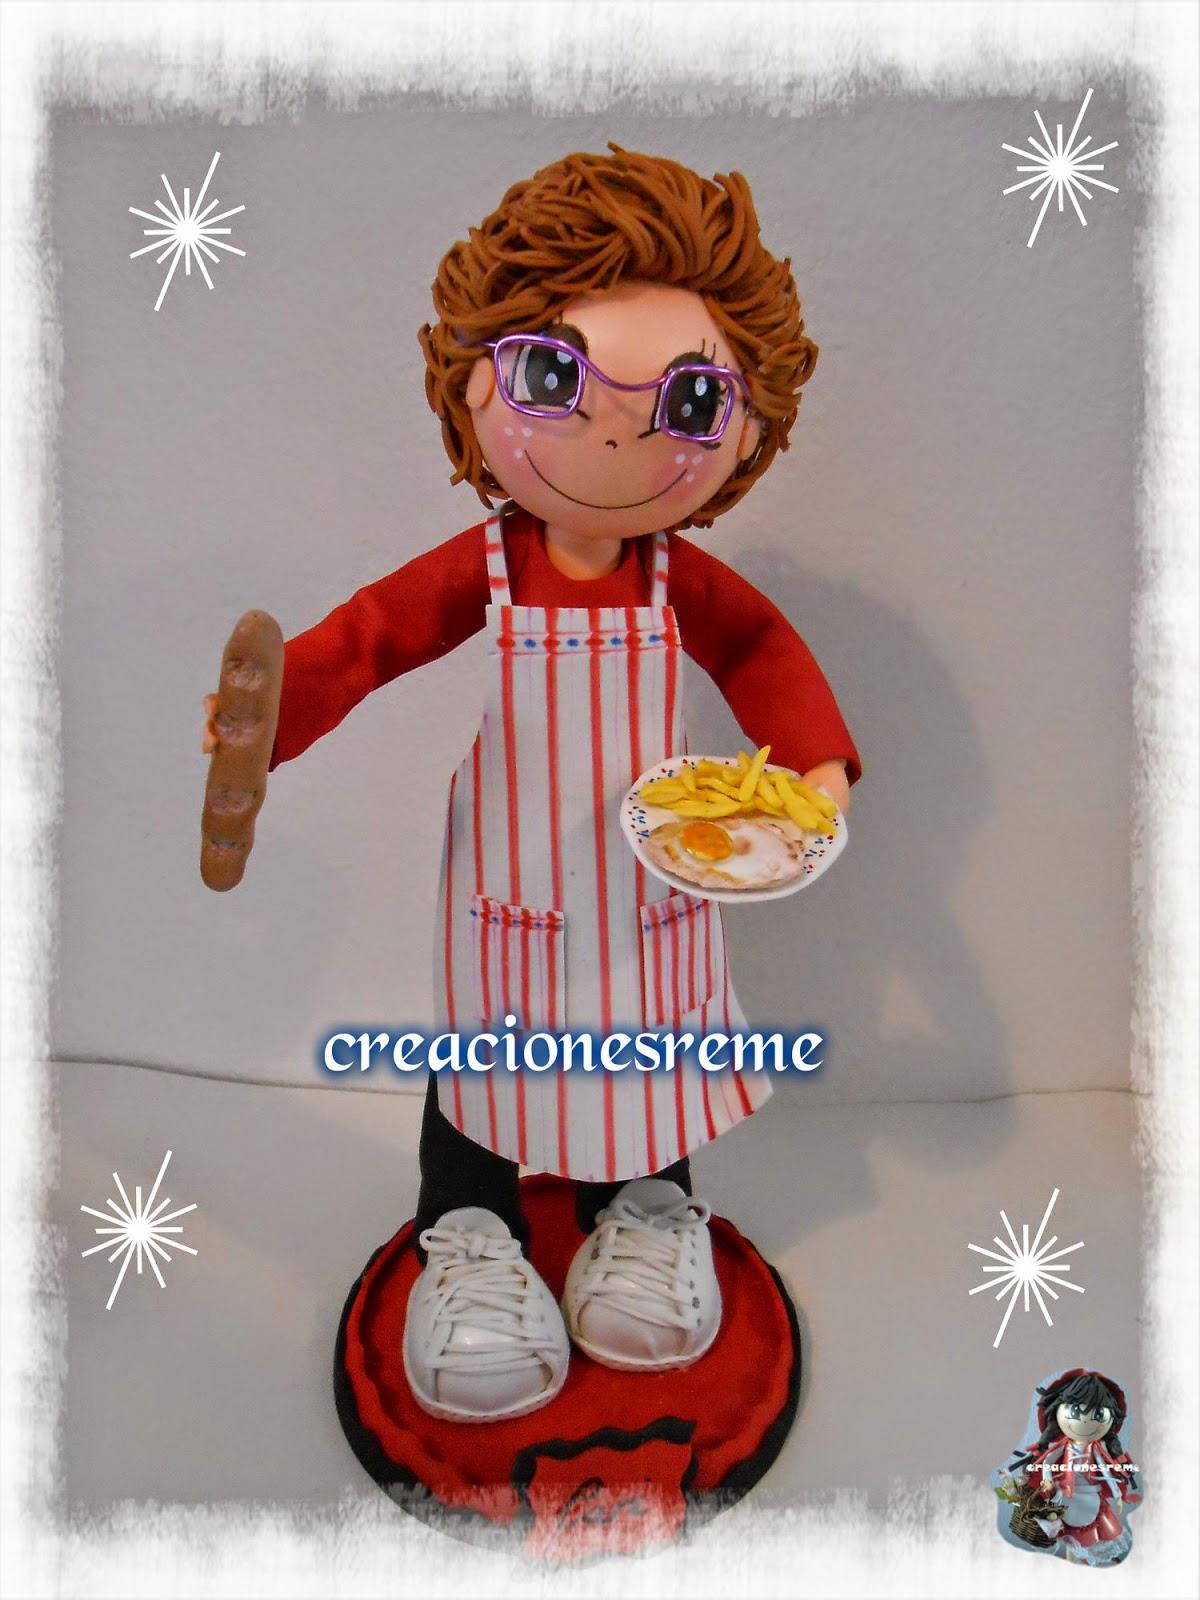 fofucha-creacionesreme-fofucha –extremeña-huevos-fritos-goma-eva-las-mejores-fofuchas-cocinera-goma-eva